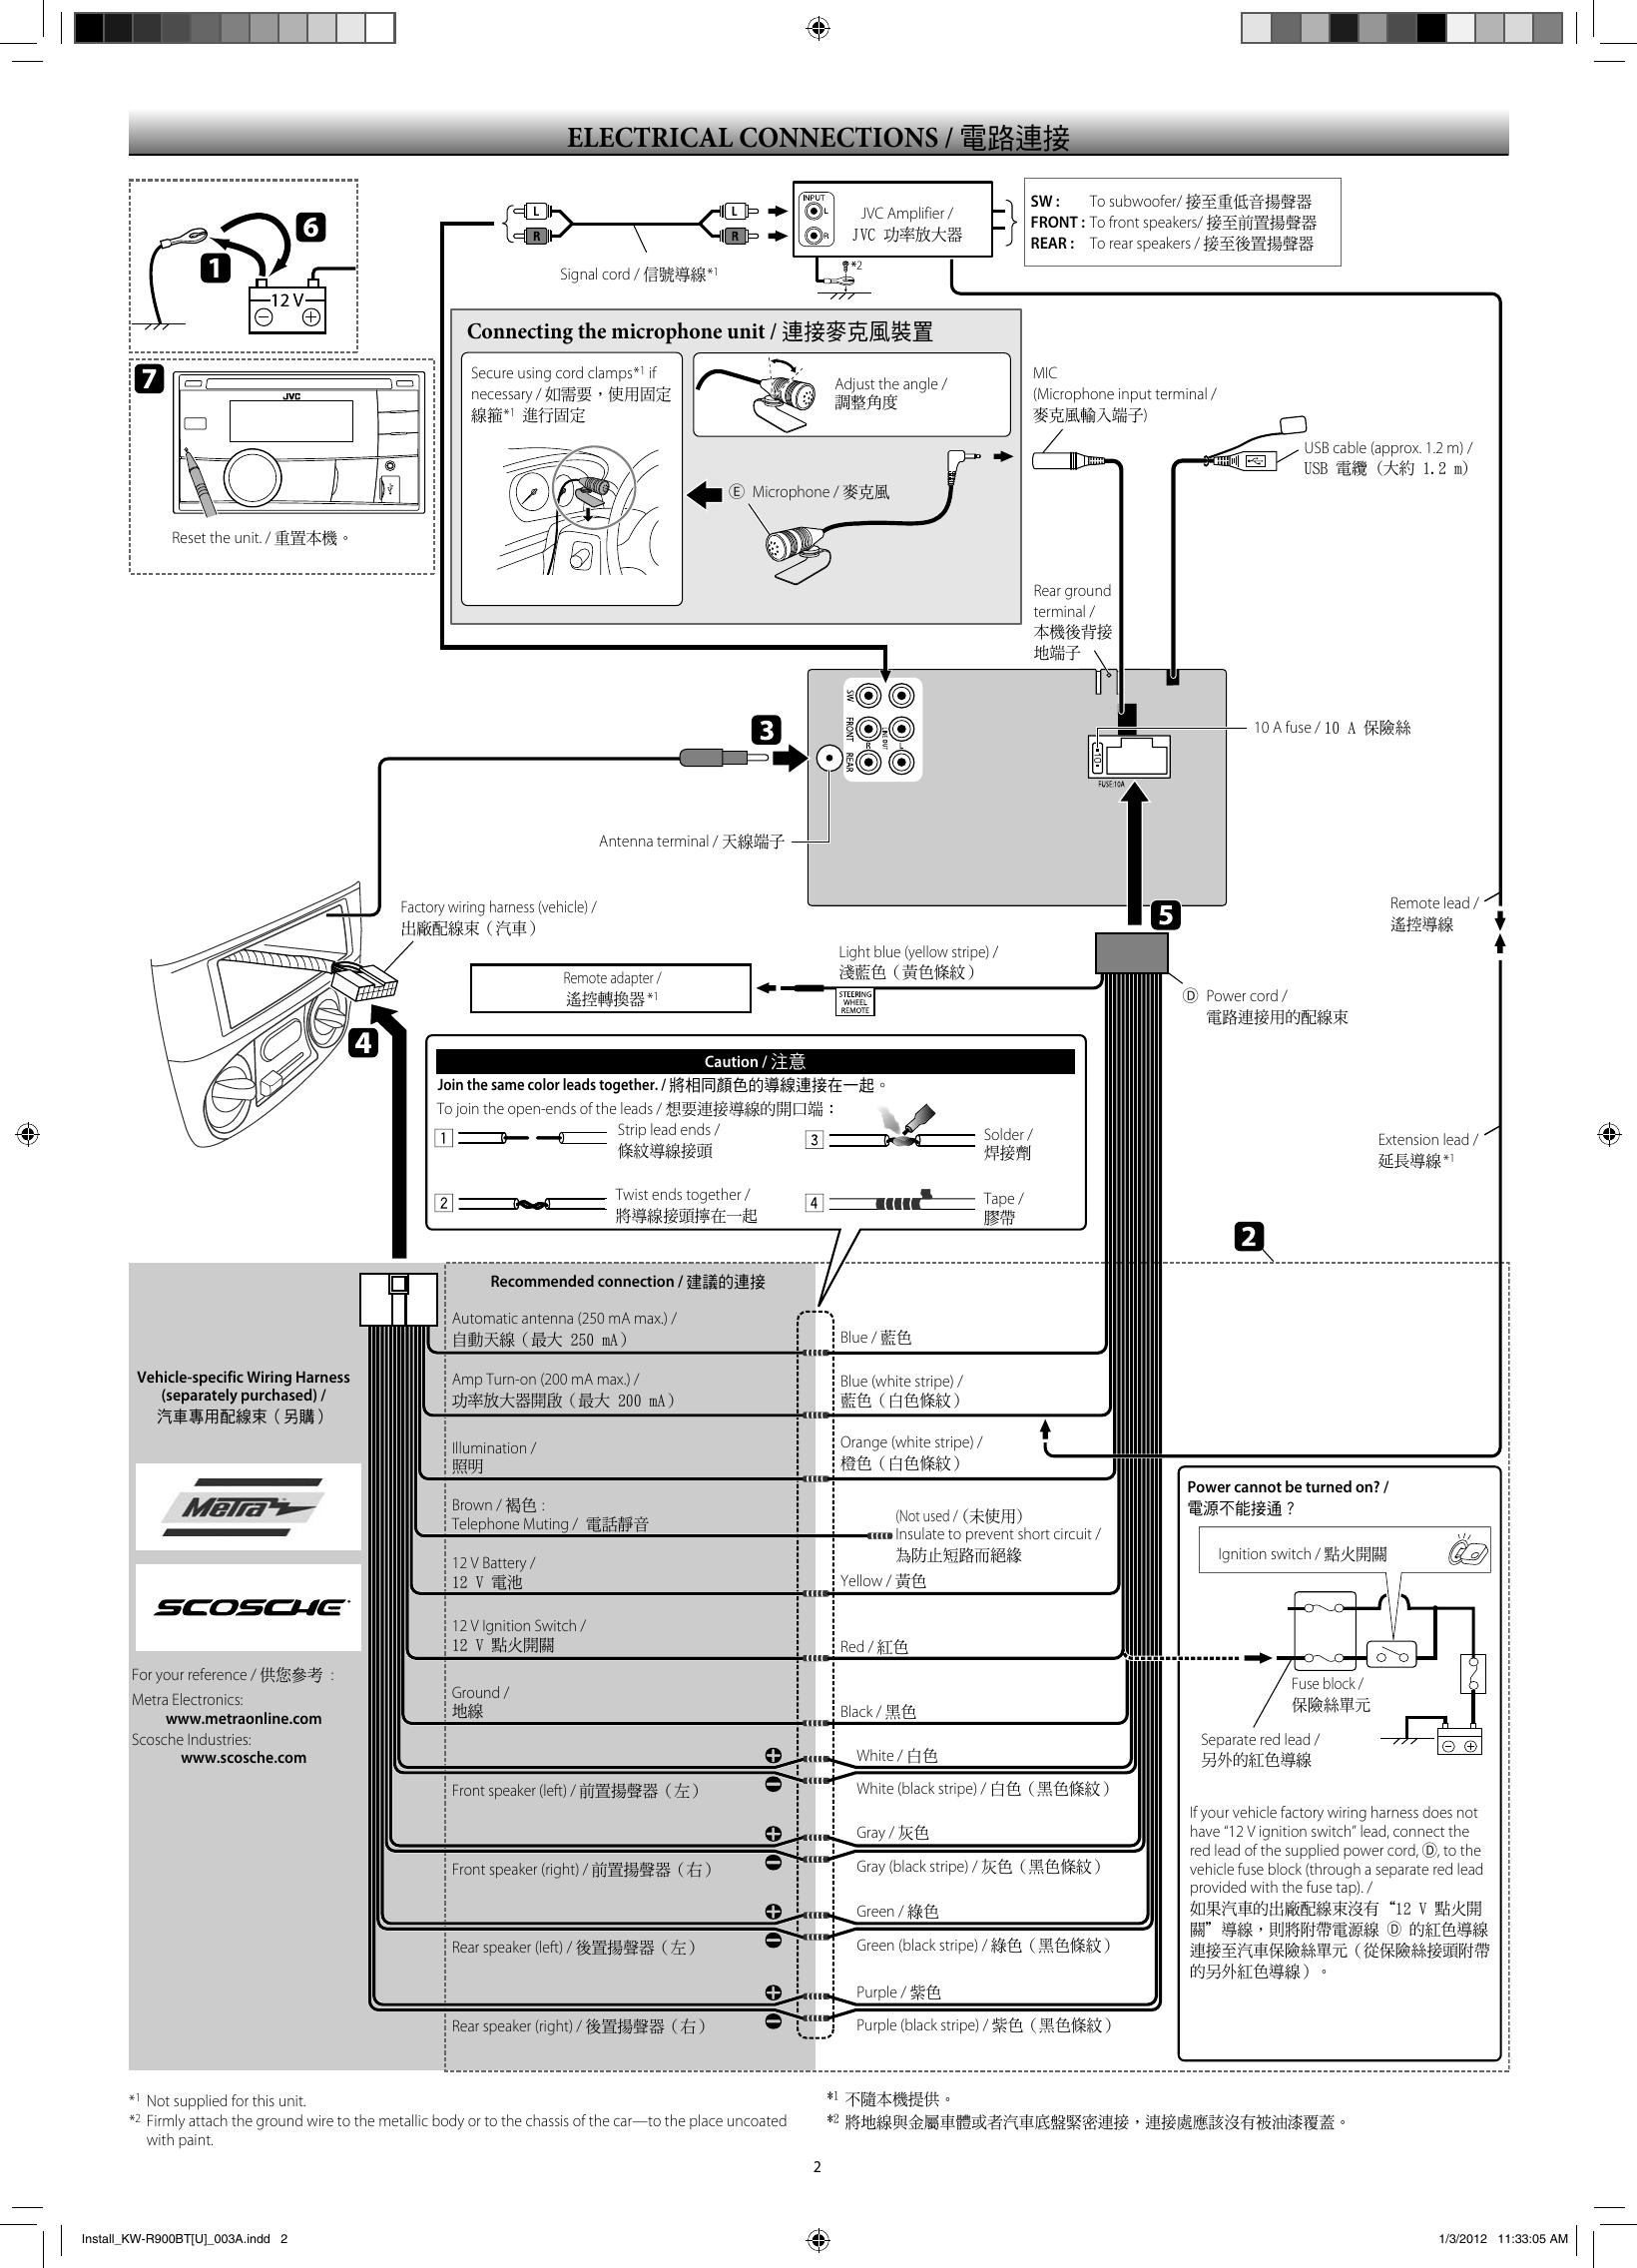 BF1DB Kw R900bt Wiring Diagram | Digital Resources on jvc harness diagram, jvc kd r200 wire diagram, standard car stereo wire diagram, jvc kd s29 wiring, jvc speaker, jvc user manual, jvc wiring harness, jvc kd r330 wiring, sony stereo wire harness diagram, jvc dvd car stereo wiring,